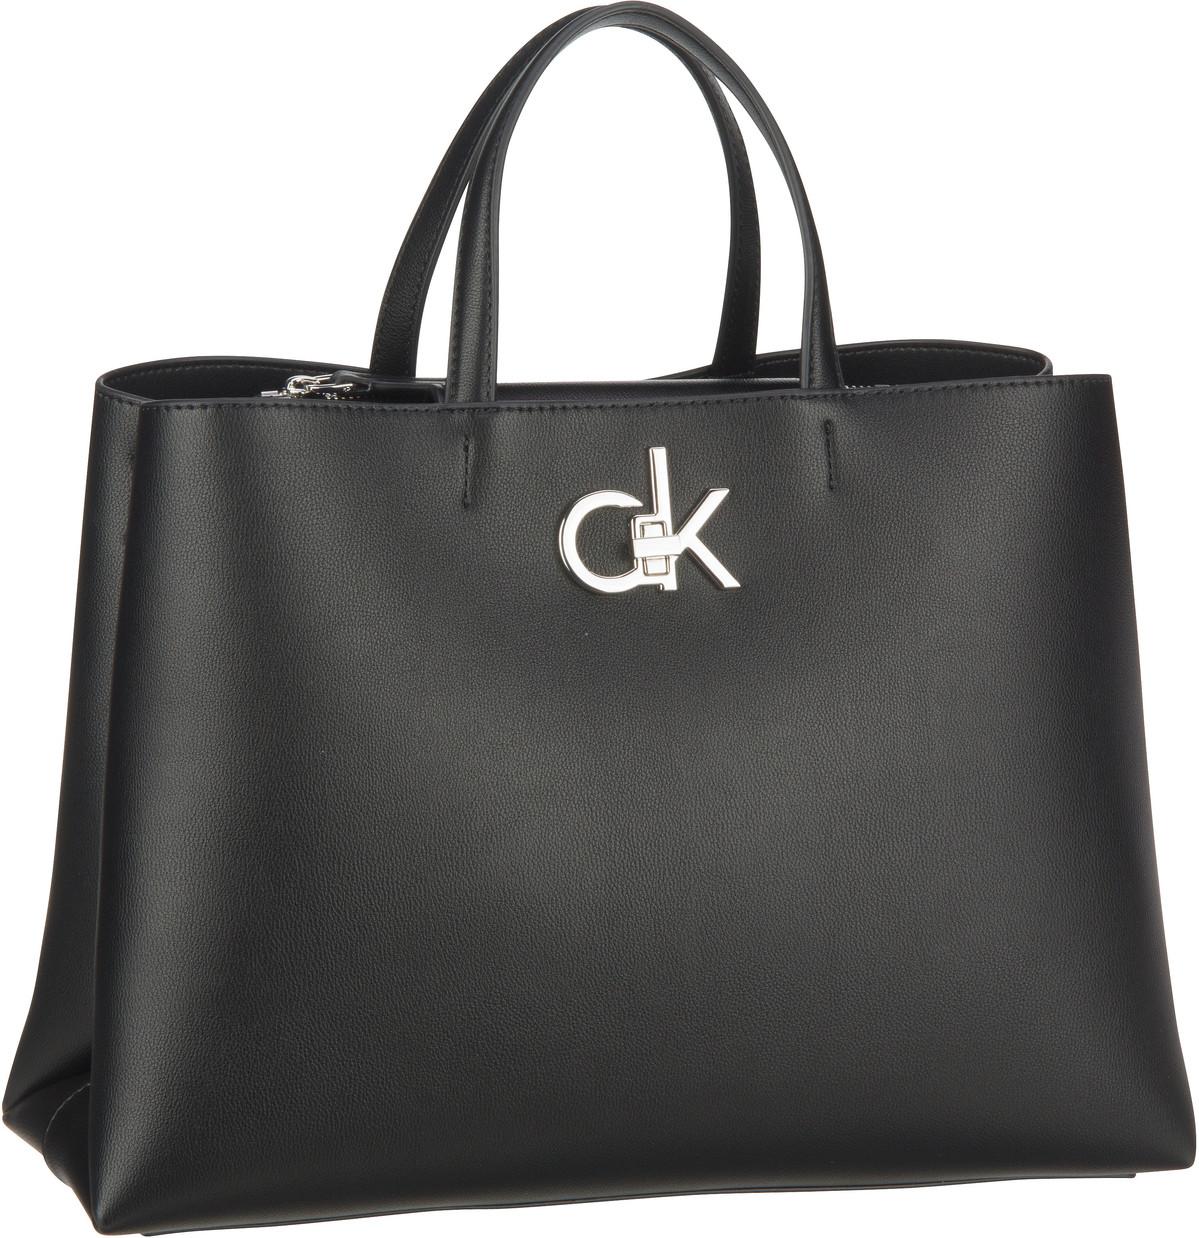 Handtasche Re-Lock Tote MD SP20 Black